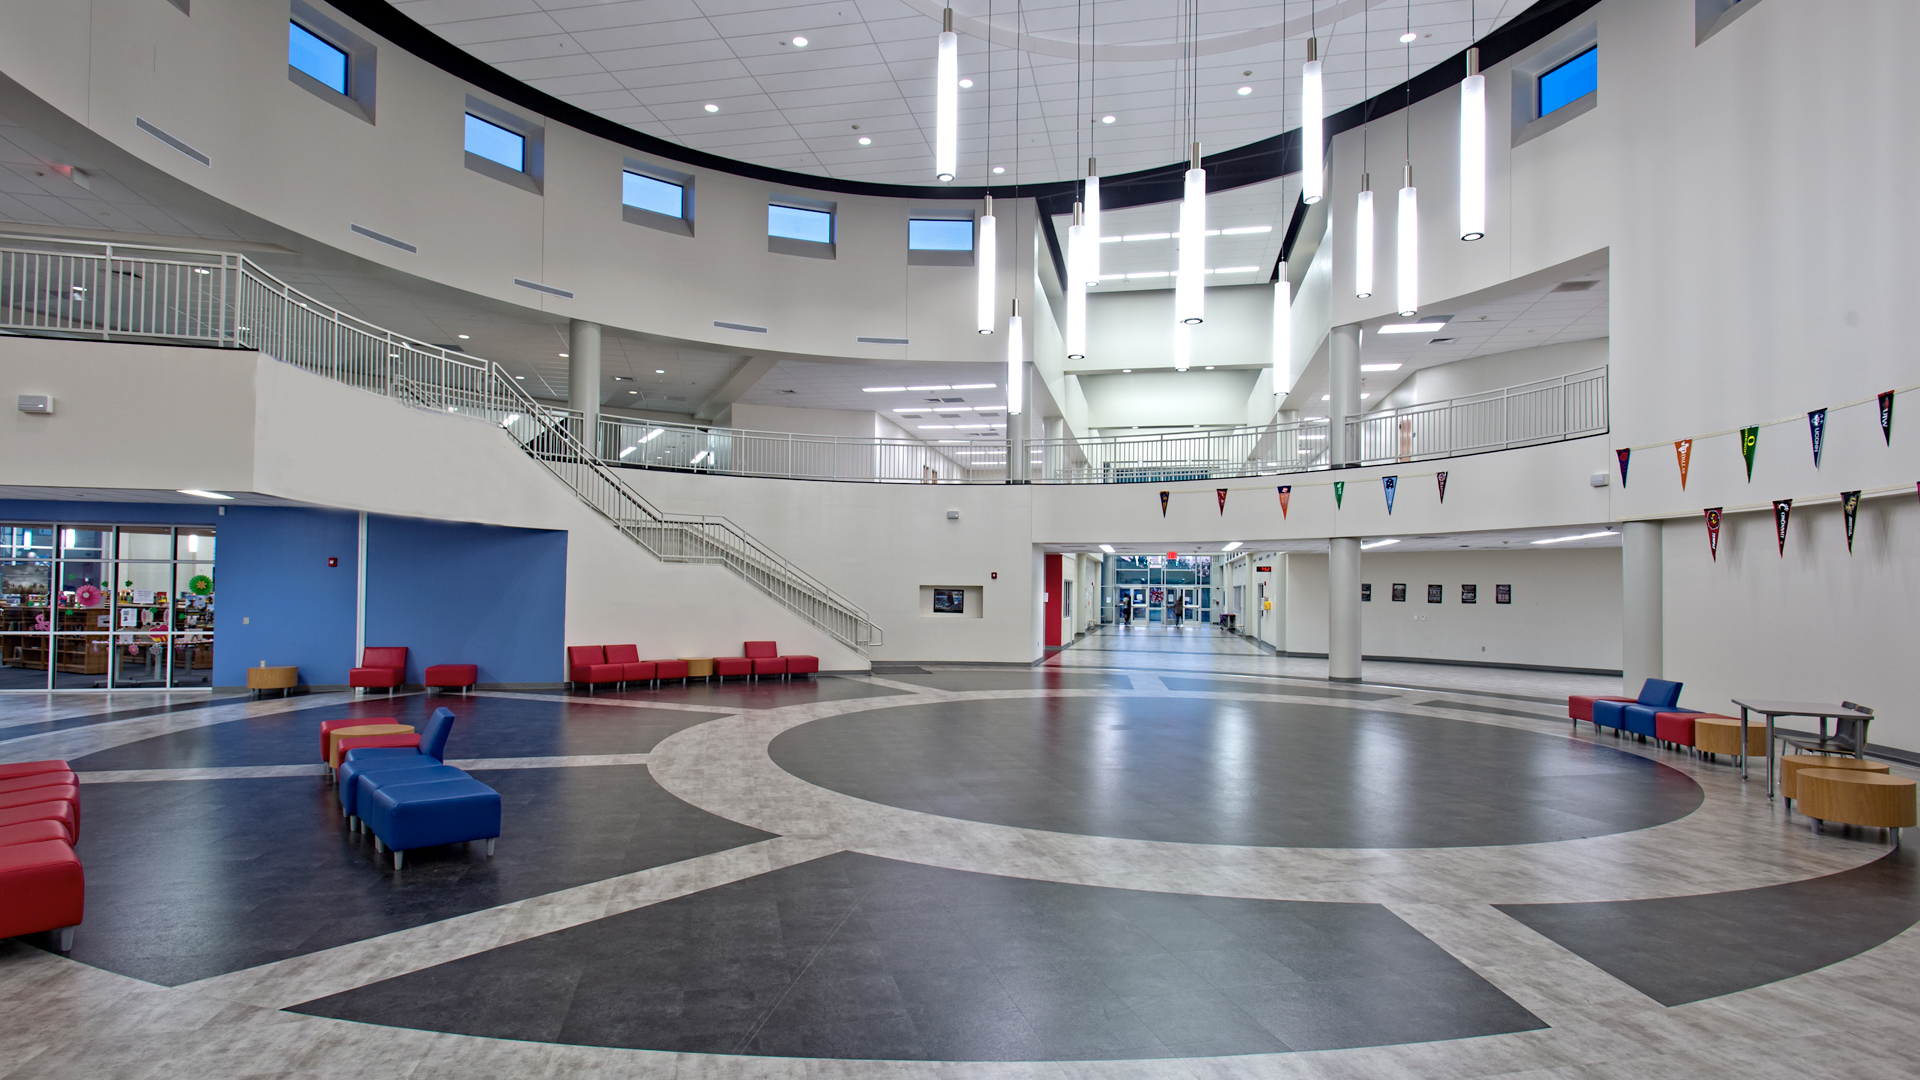 Veterans Memorial High School